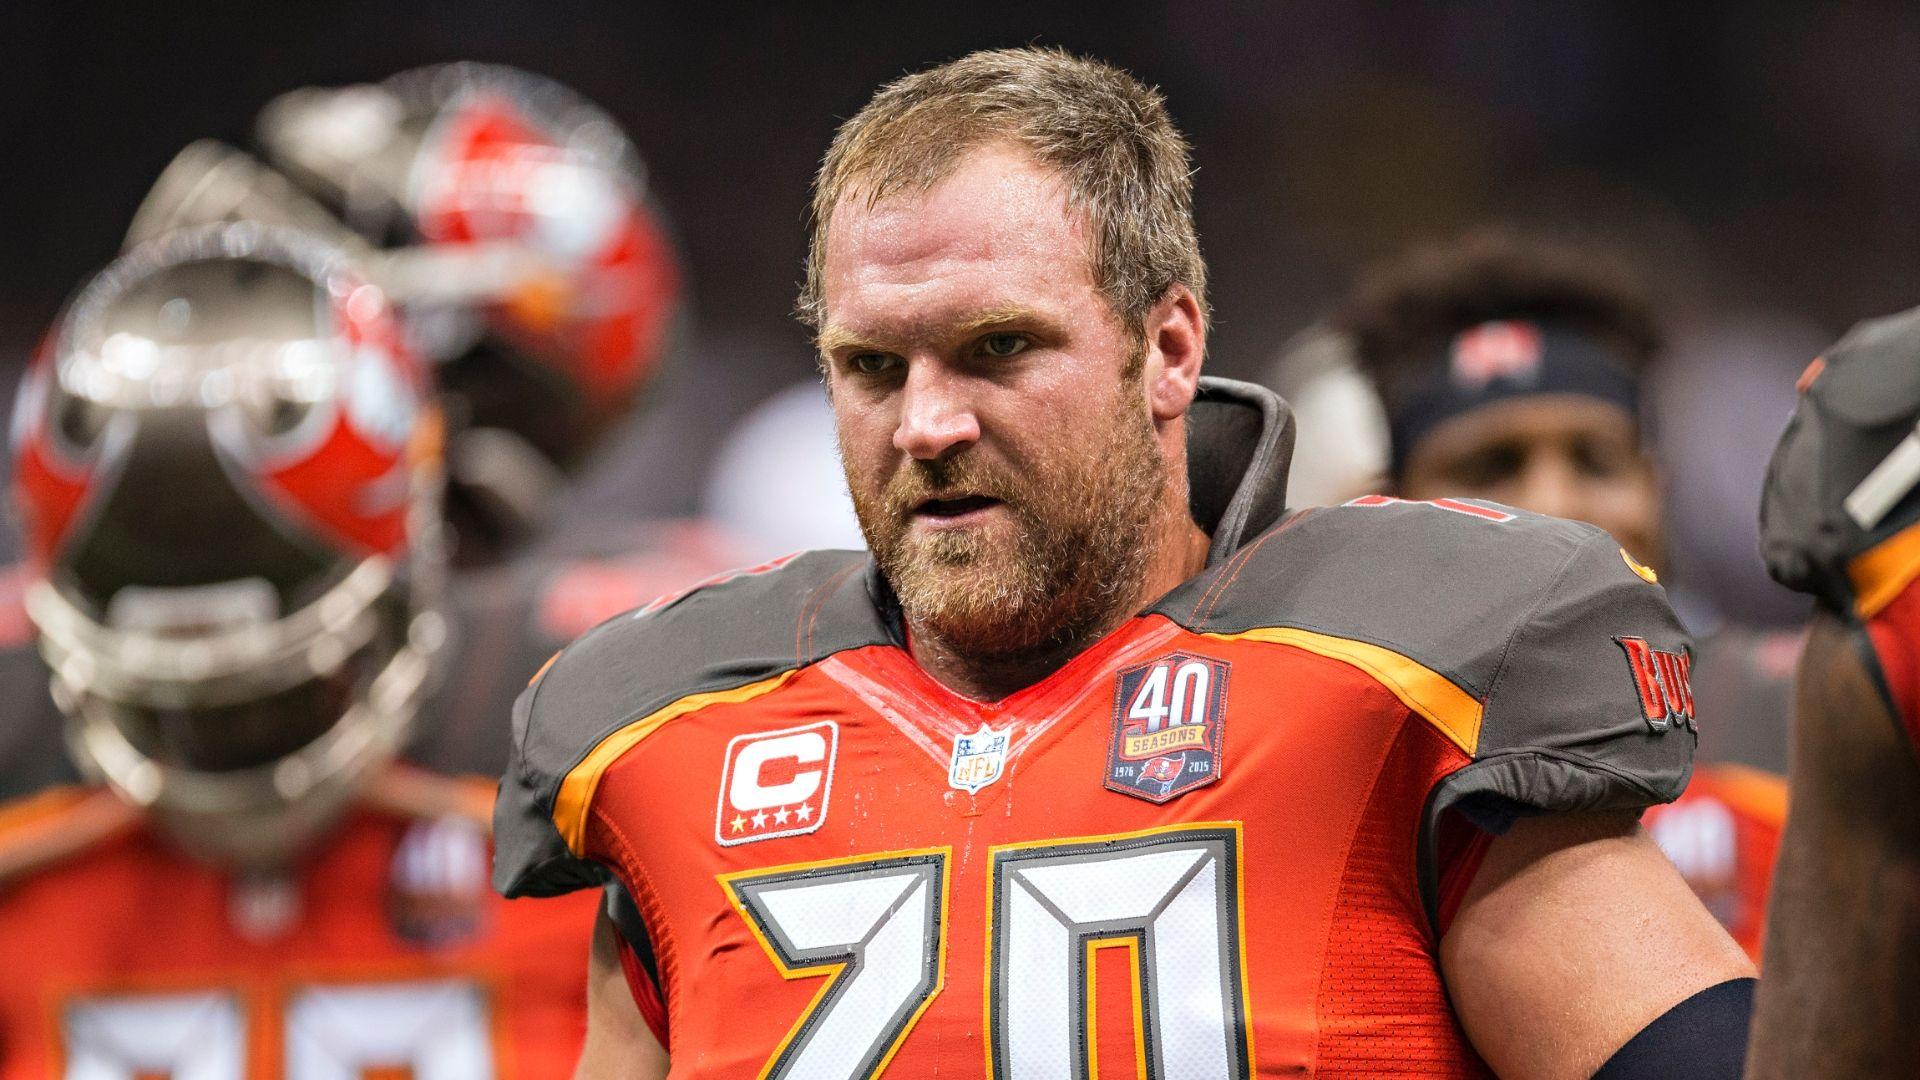 Mankins retirement leaves leadership void in Tampa Bay - ESPN Video